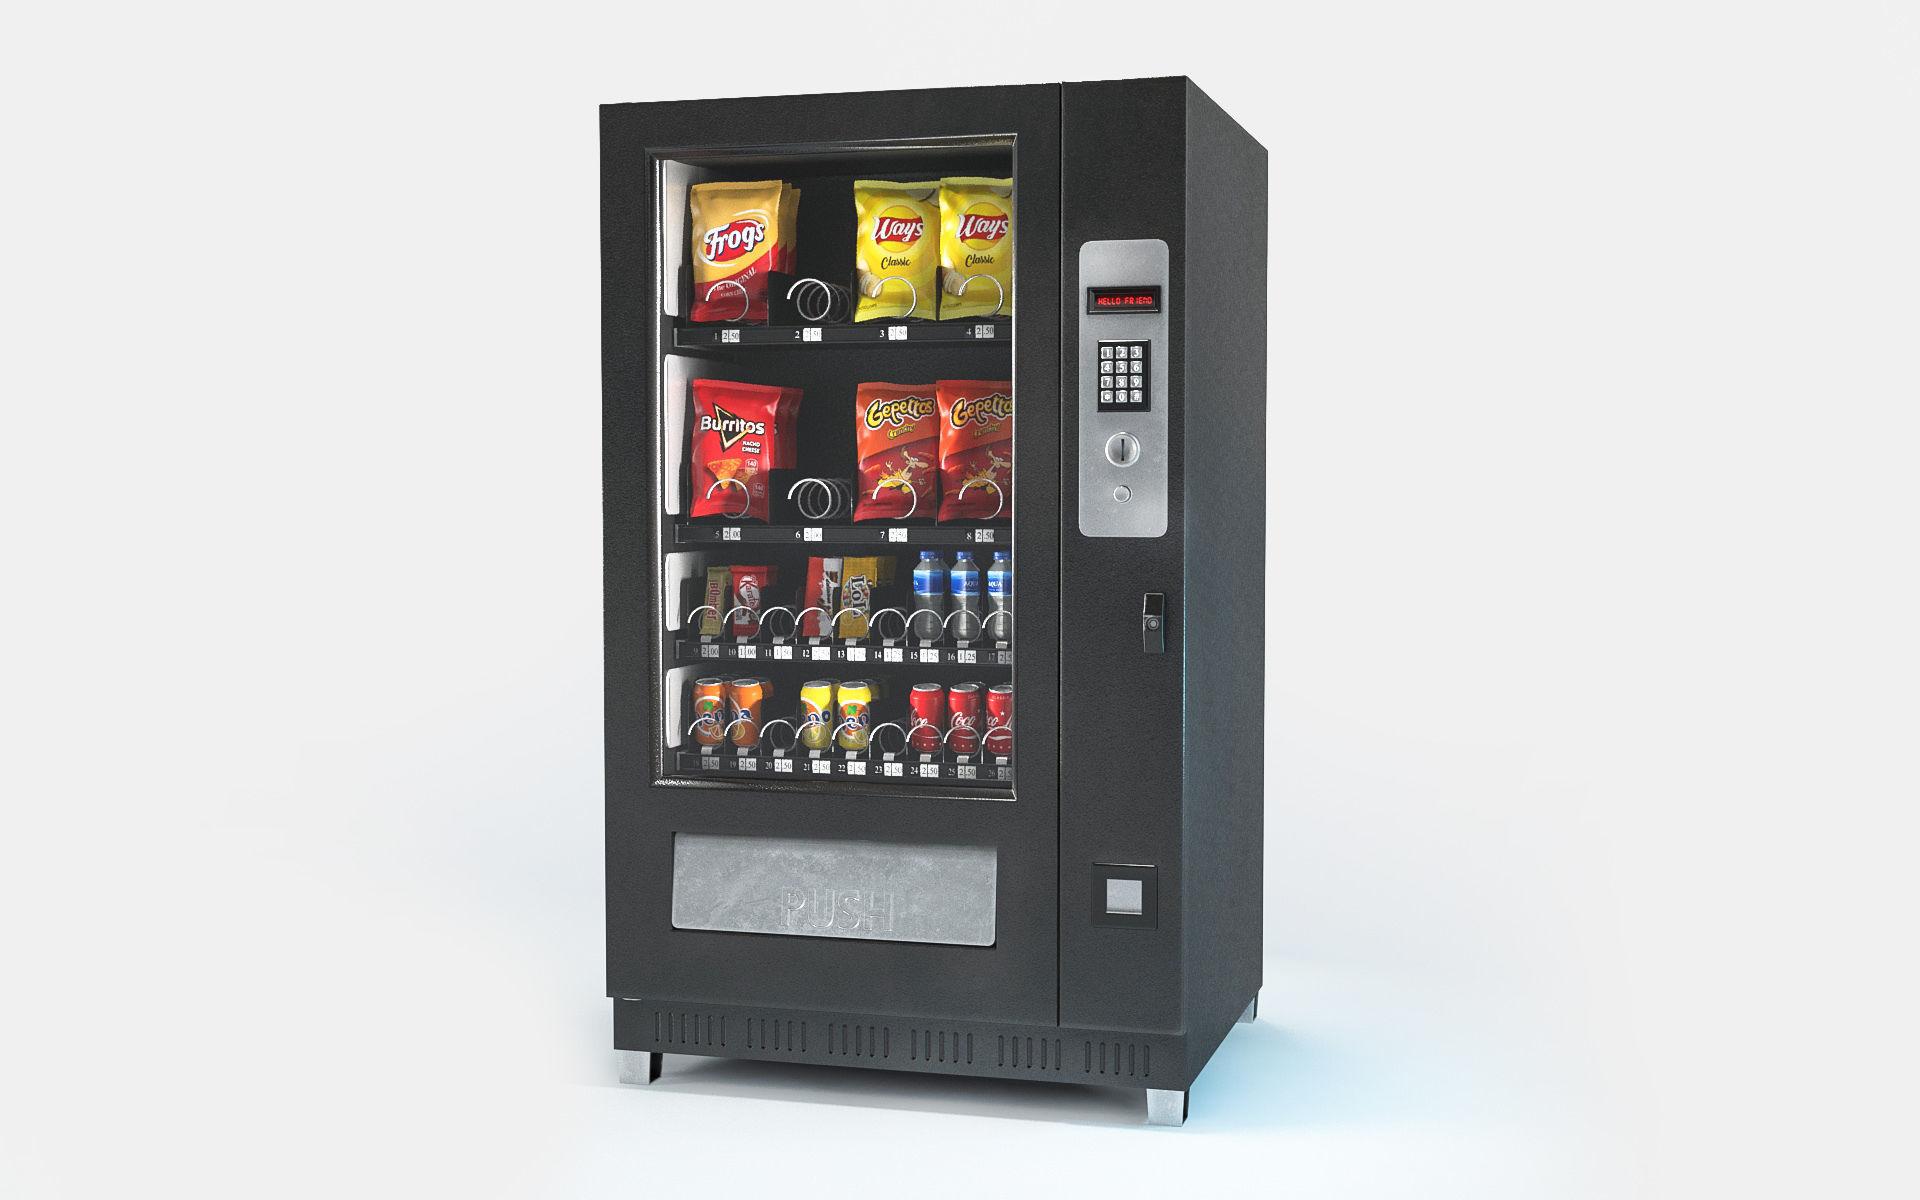 Vending machine Low-poly 3D model